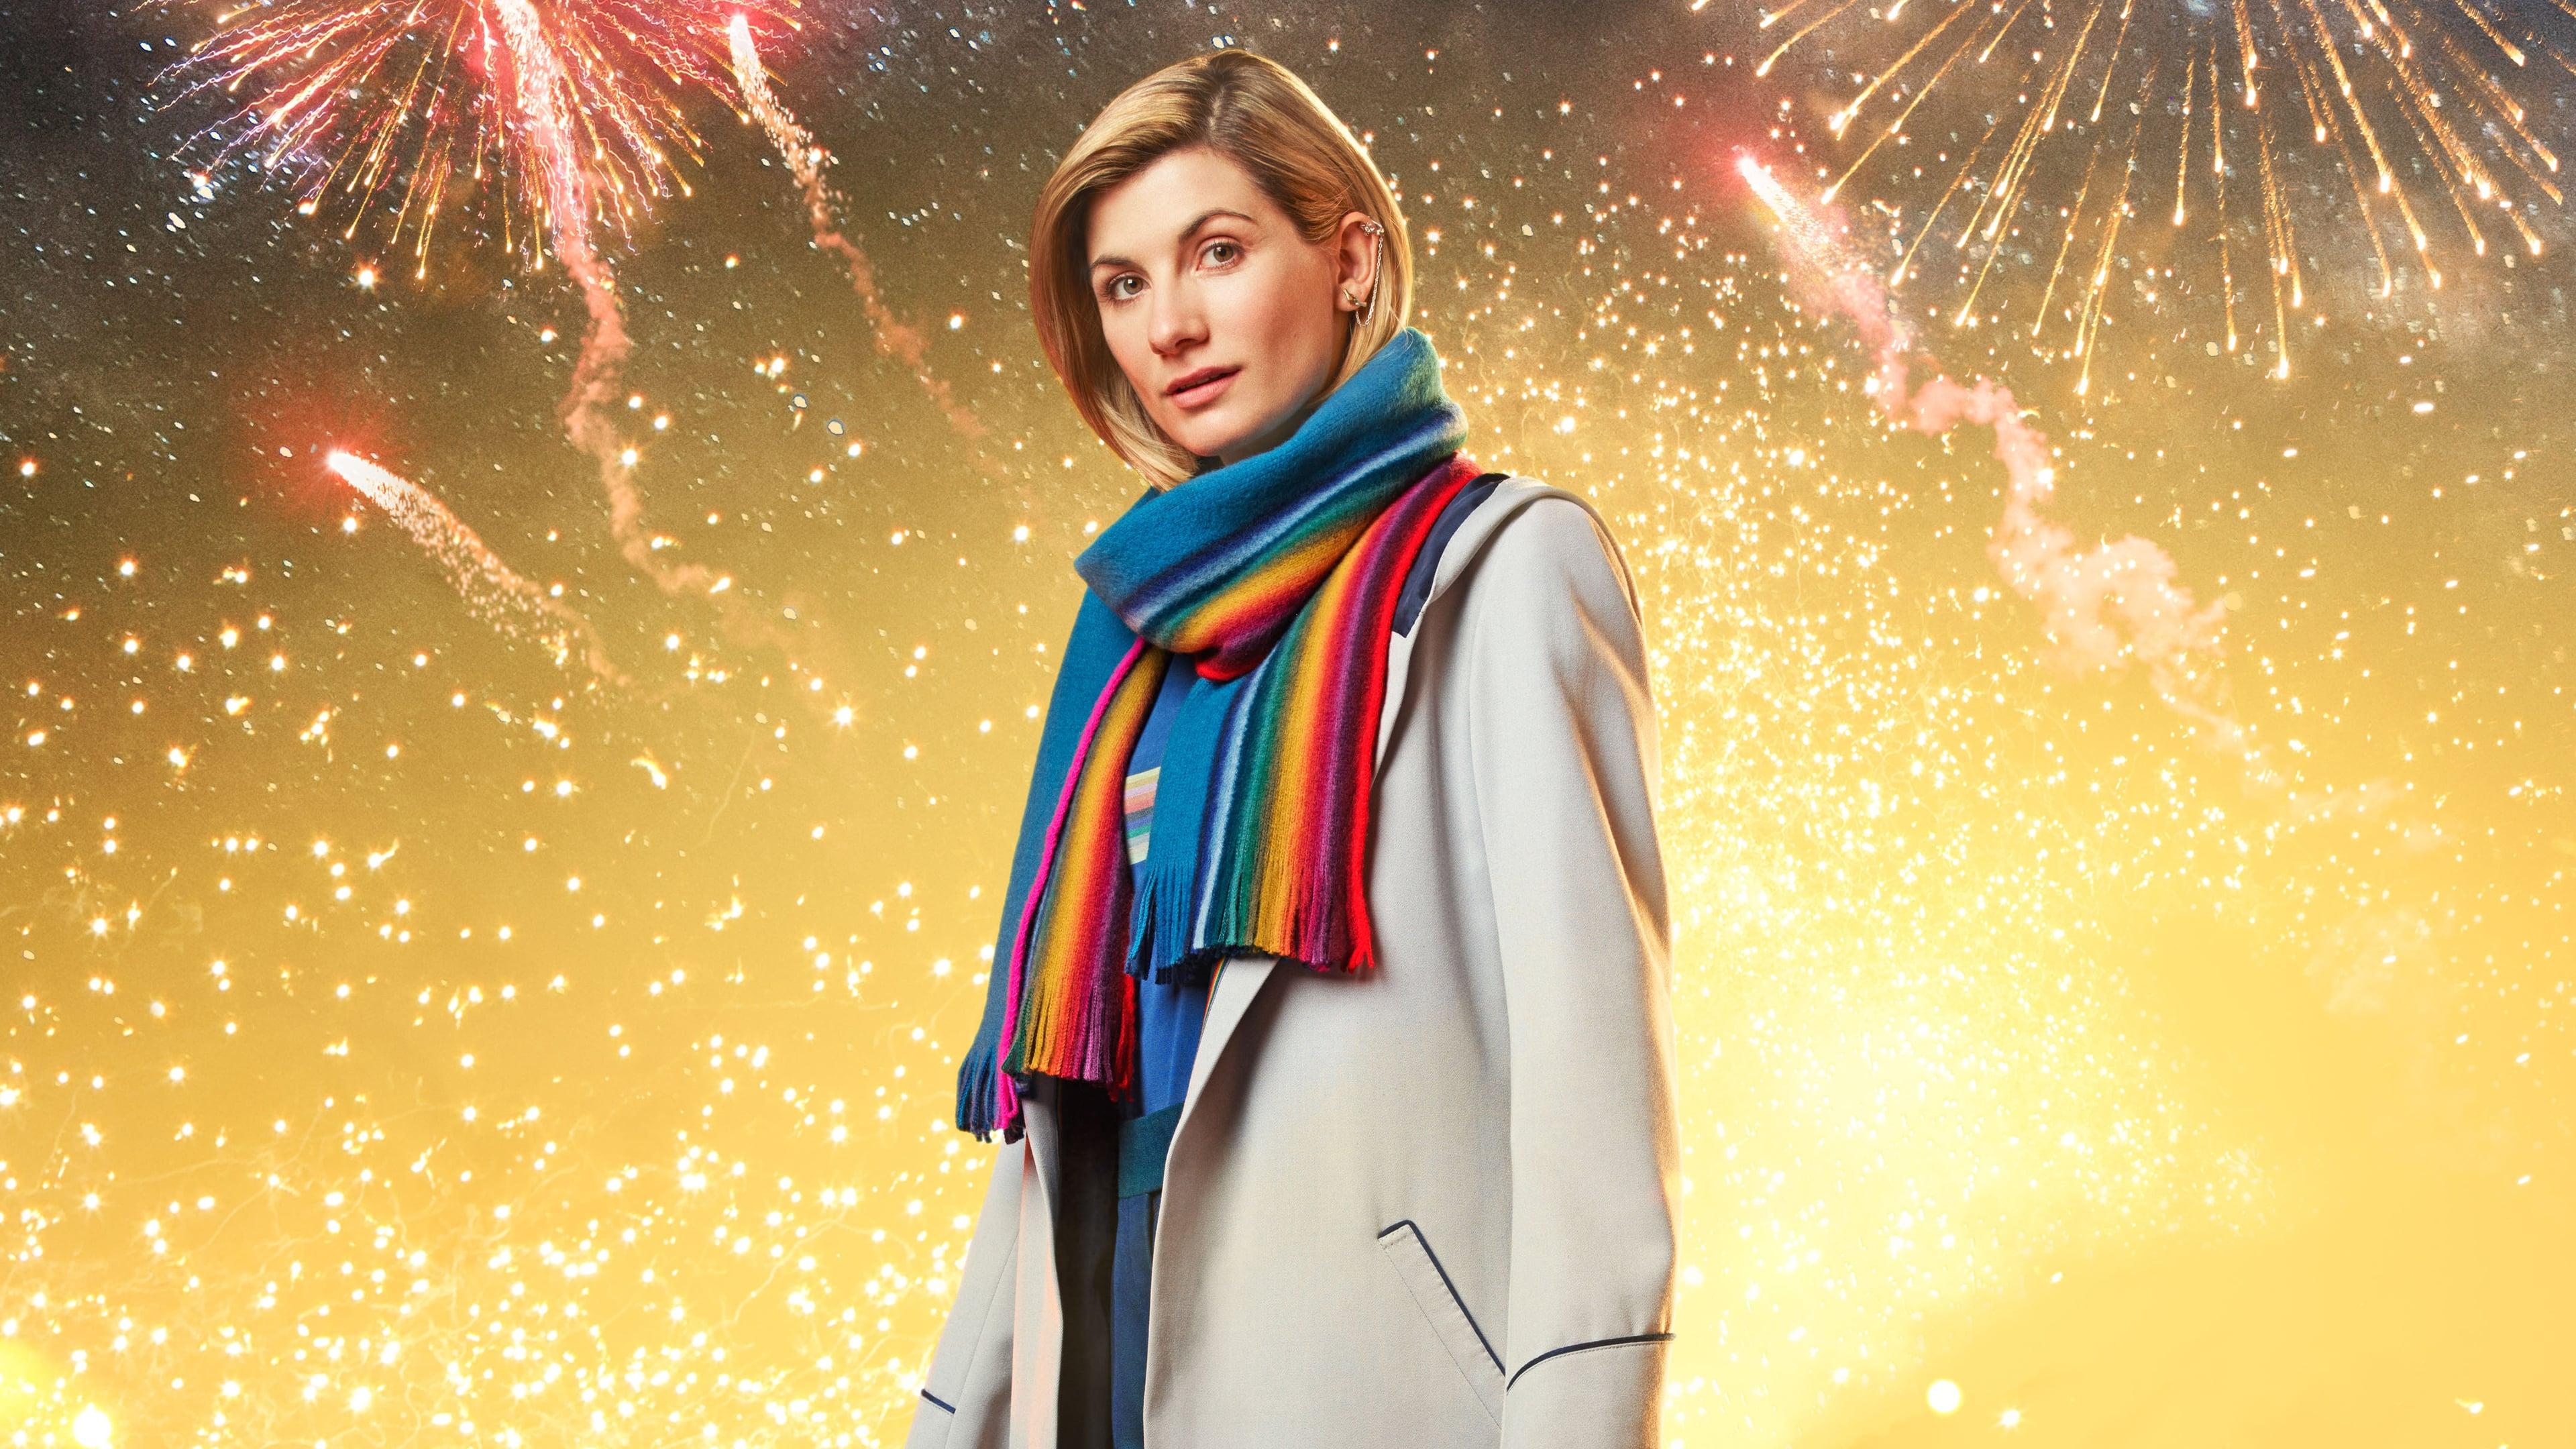 Doctor Who - Season 0 Episode 156 : Resolution